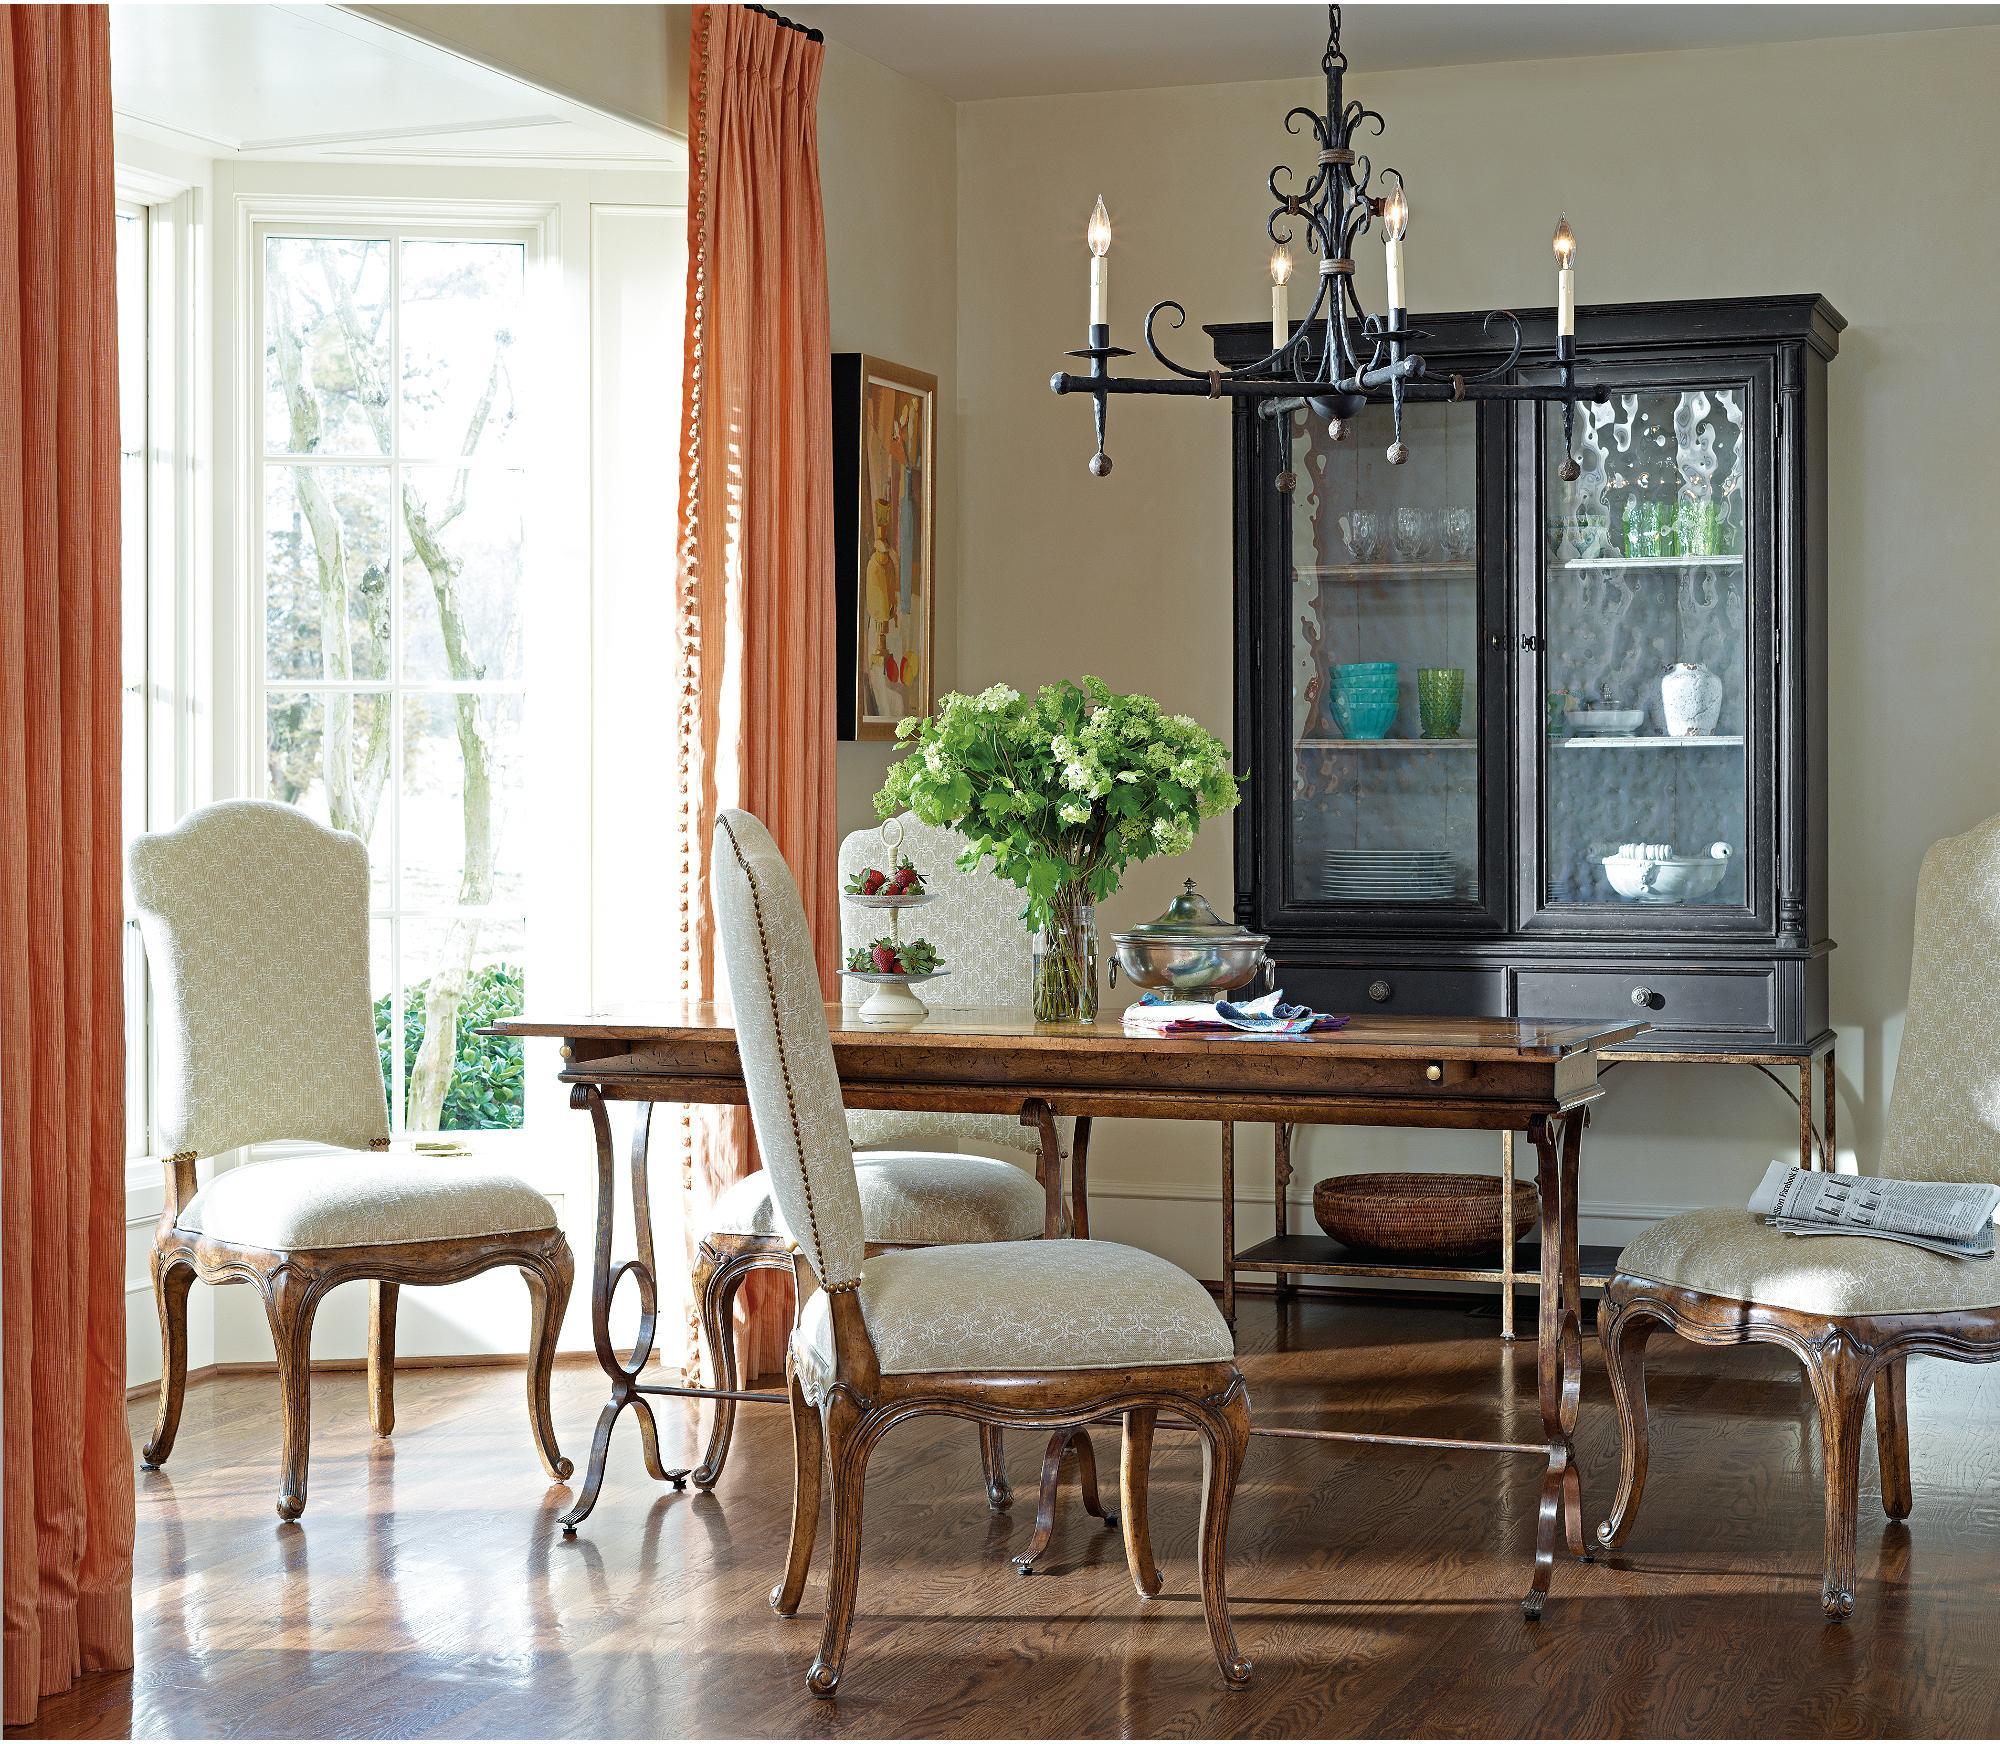 Stanley Dining Room Furniture: Arrondissement (222-8) By Stanley Furniture